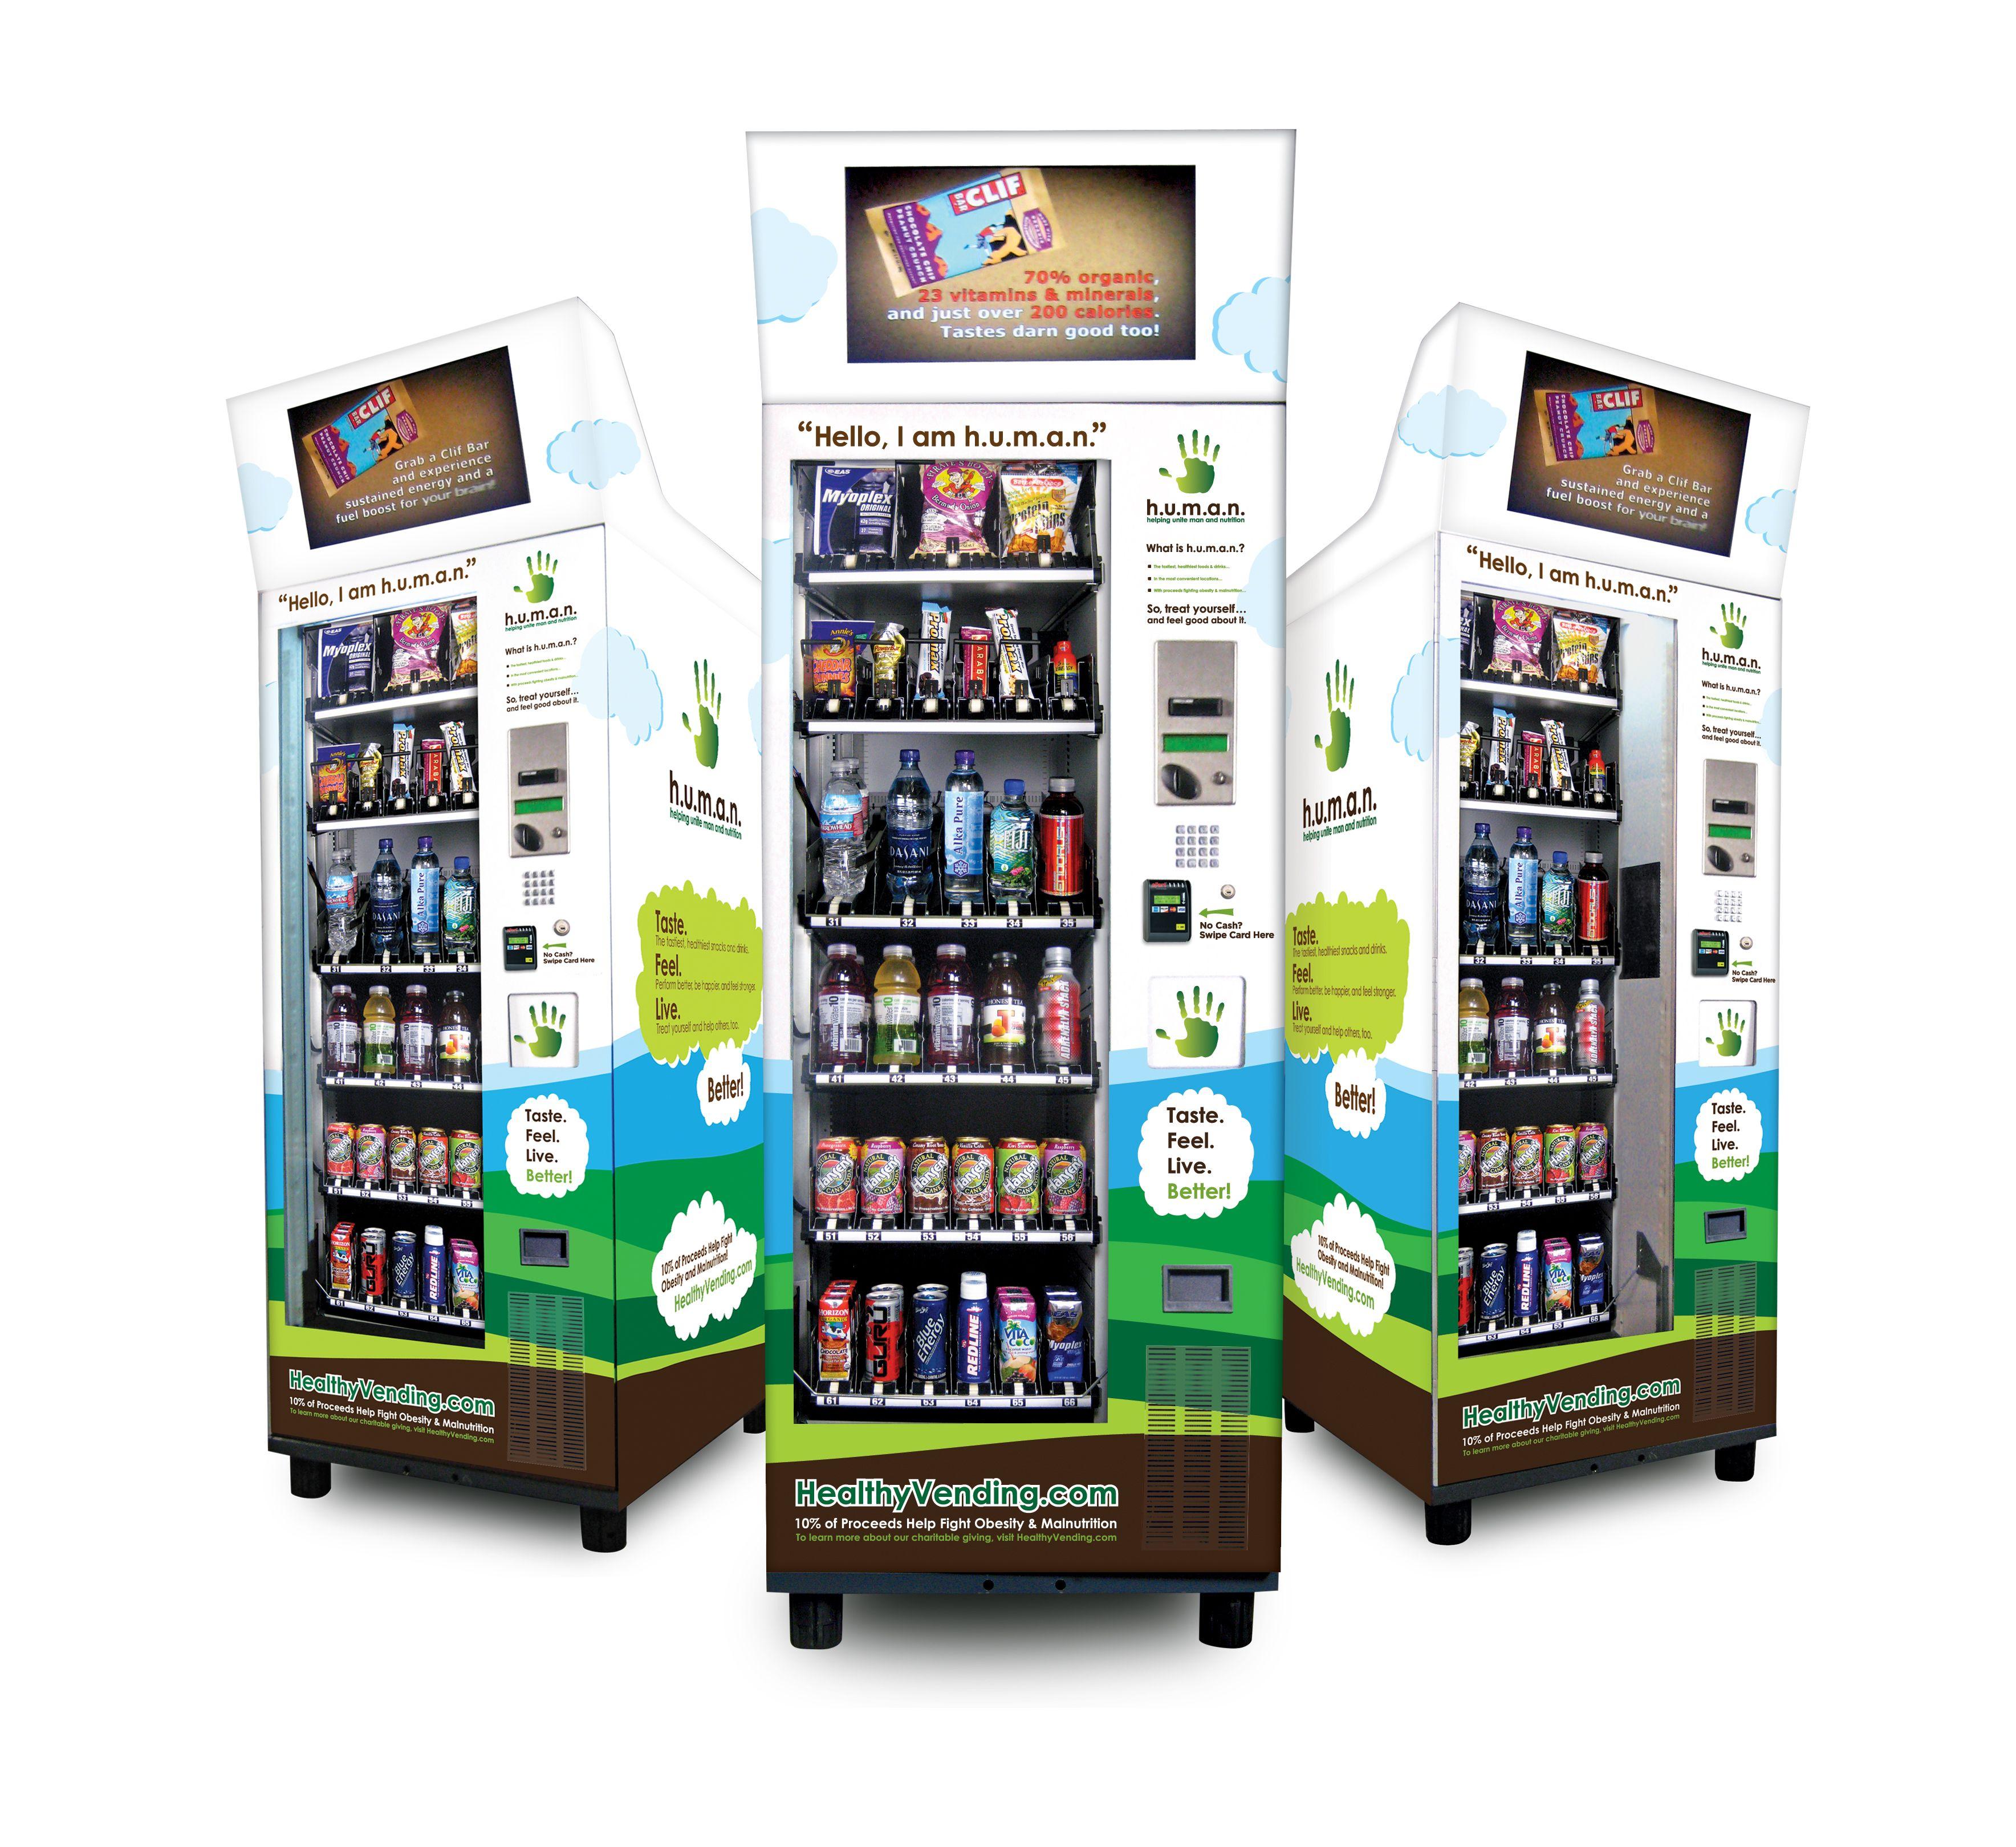 healthy vending google search hub materials lightings